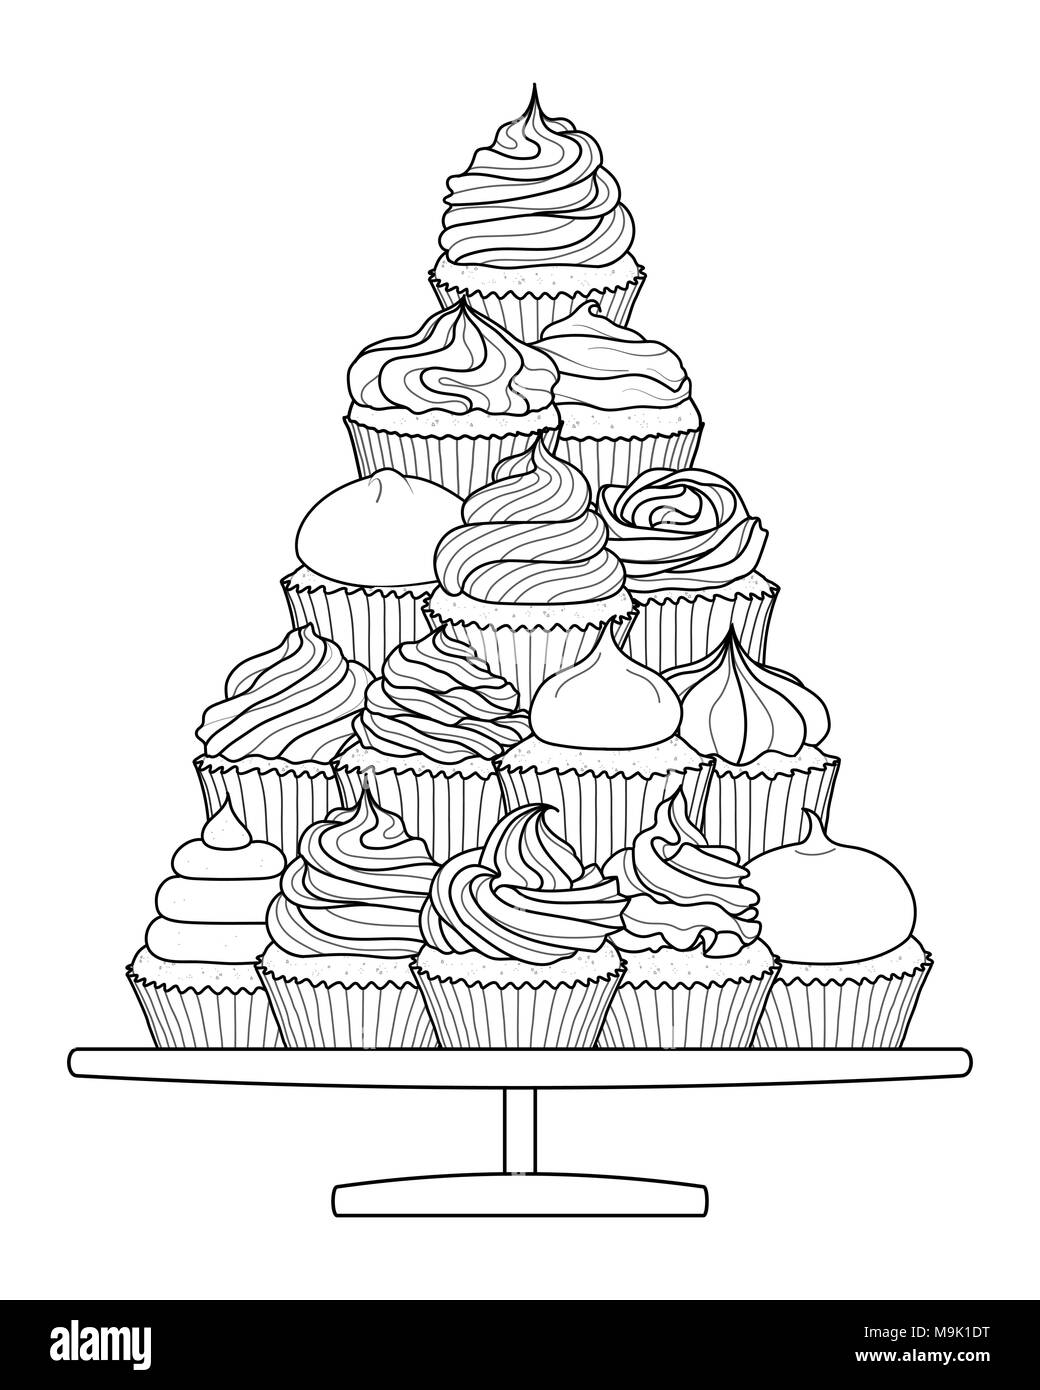 Dessert Presentation Template Stock Photos & Dessert Presentation ...